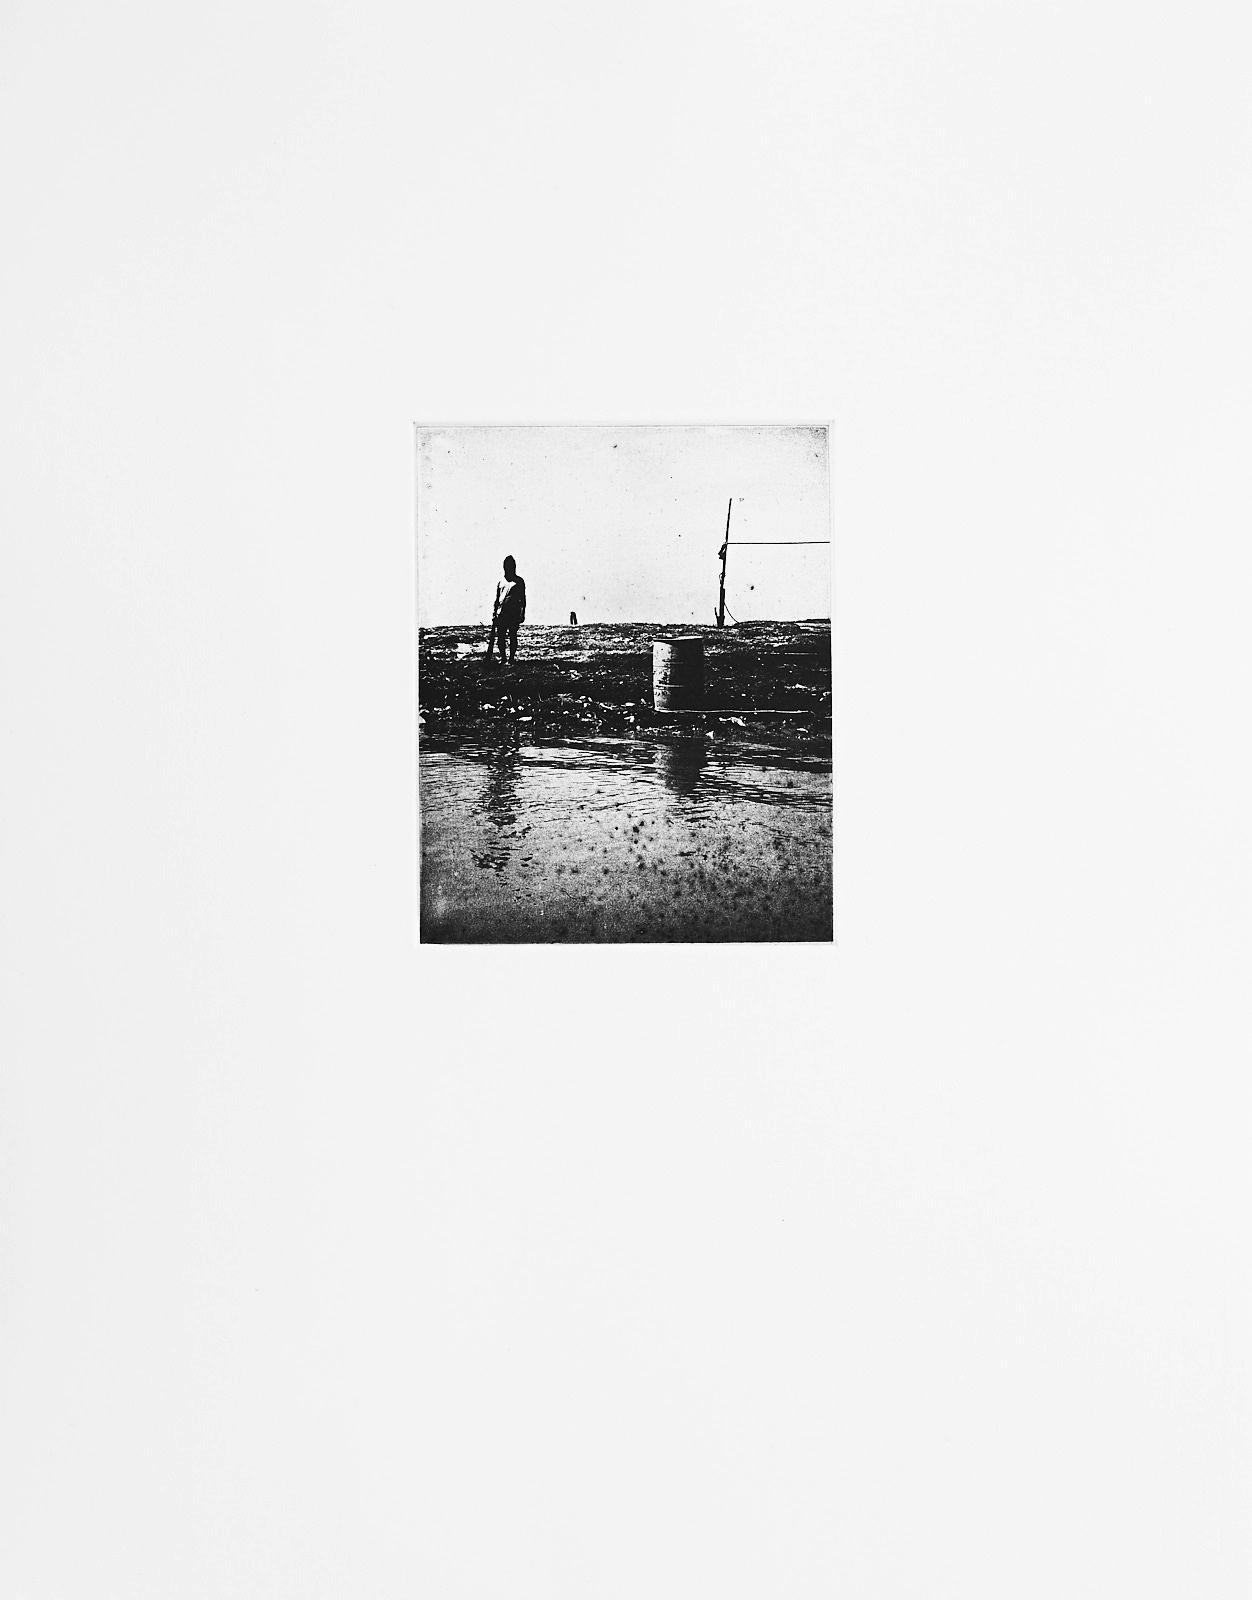 o.T.[Typologien#3]  (2018)  medium: Photogravure  size: 36 x 46 cm  paper: Zerkall 270 g/qm  plate: 11.7 x 14.7 cm  edition: 6 copies  numbered: 1/4 - 4/4, 2 e.a.  printer: FWU